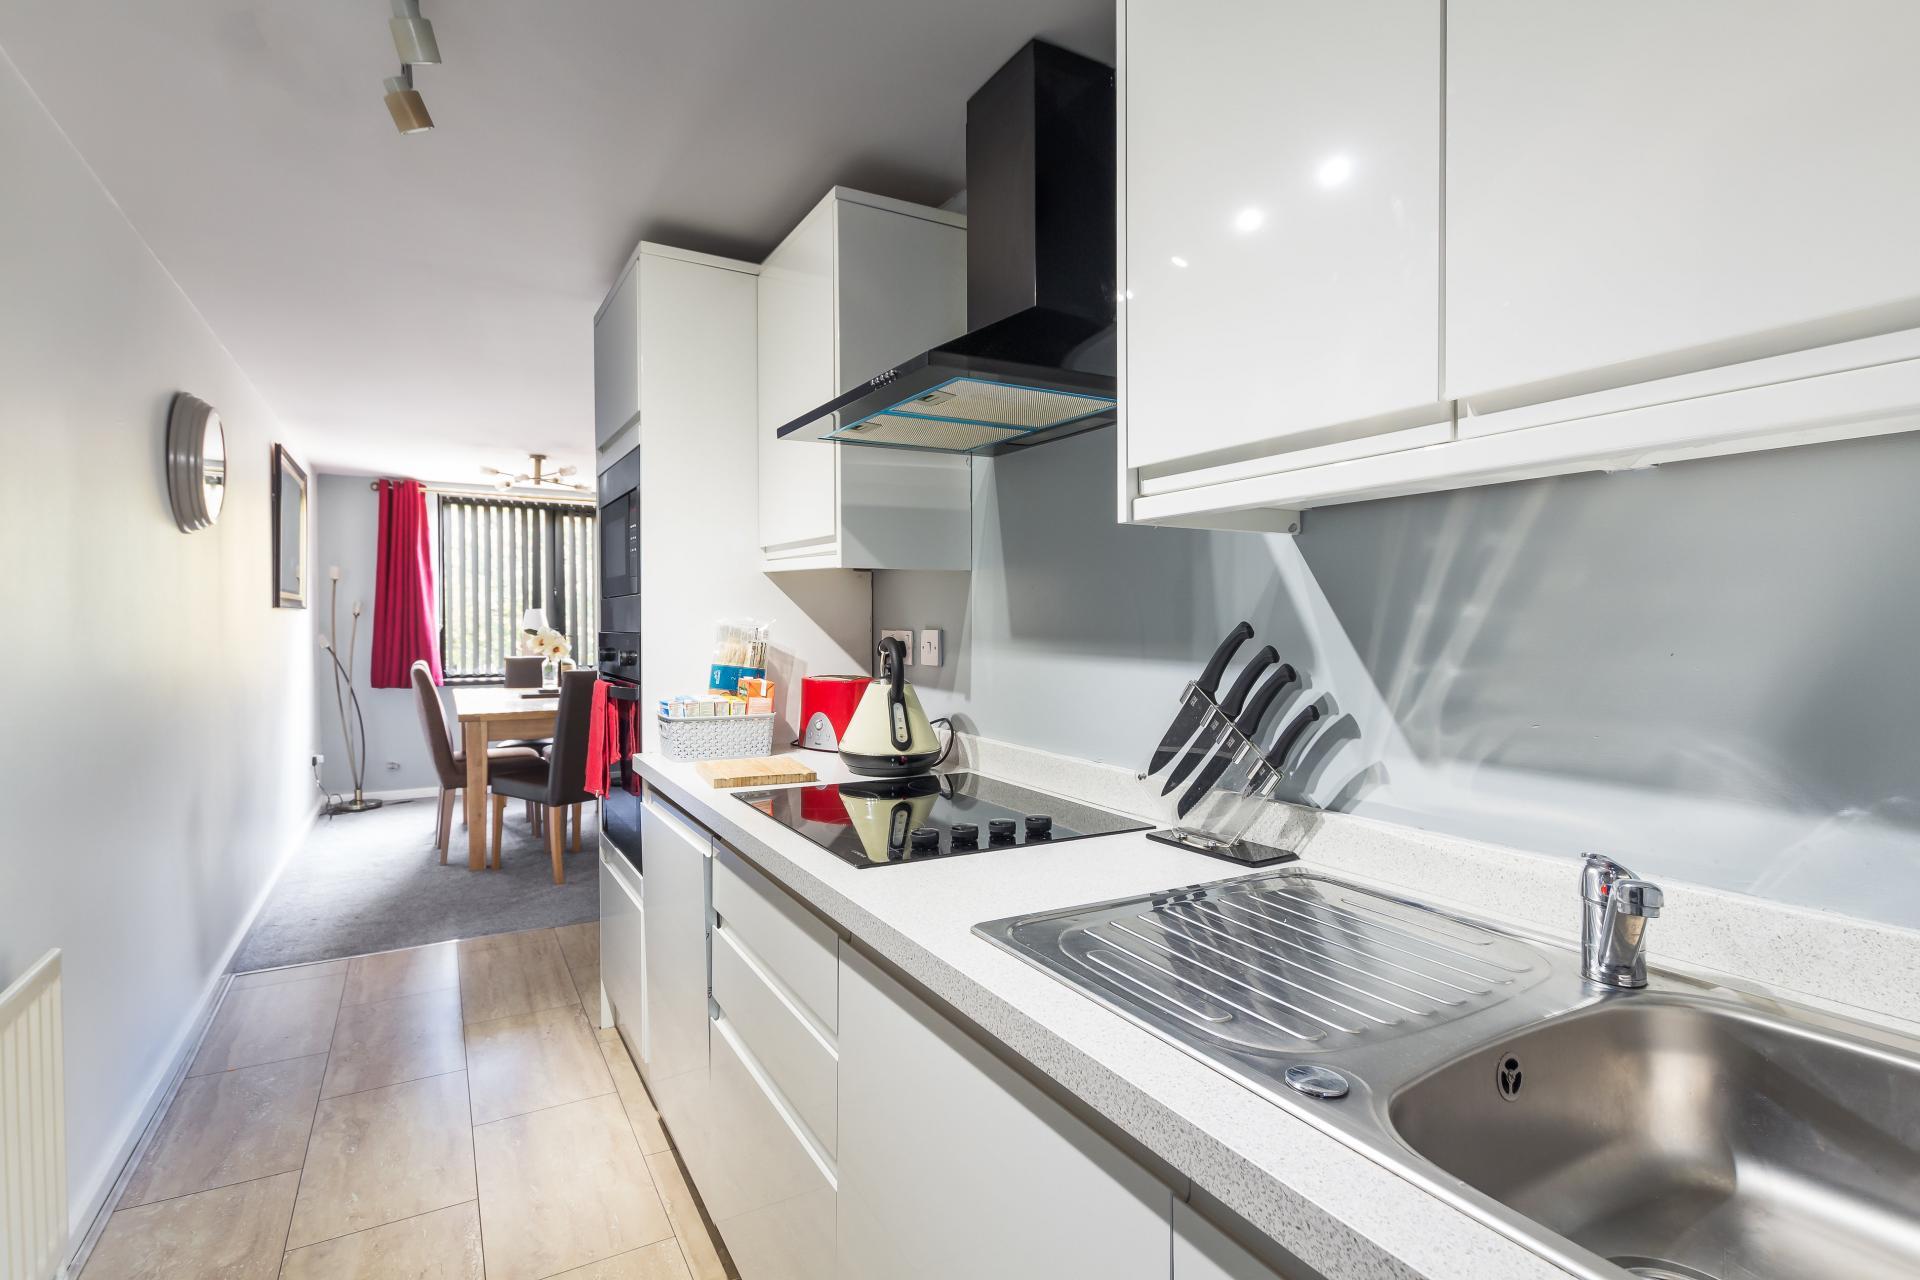 Sink at Suitestayzzz Apartments